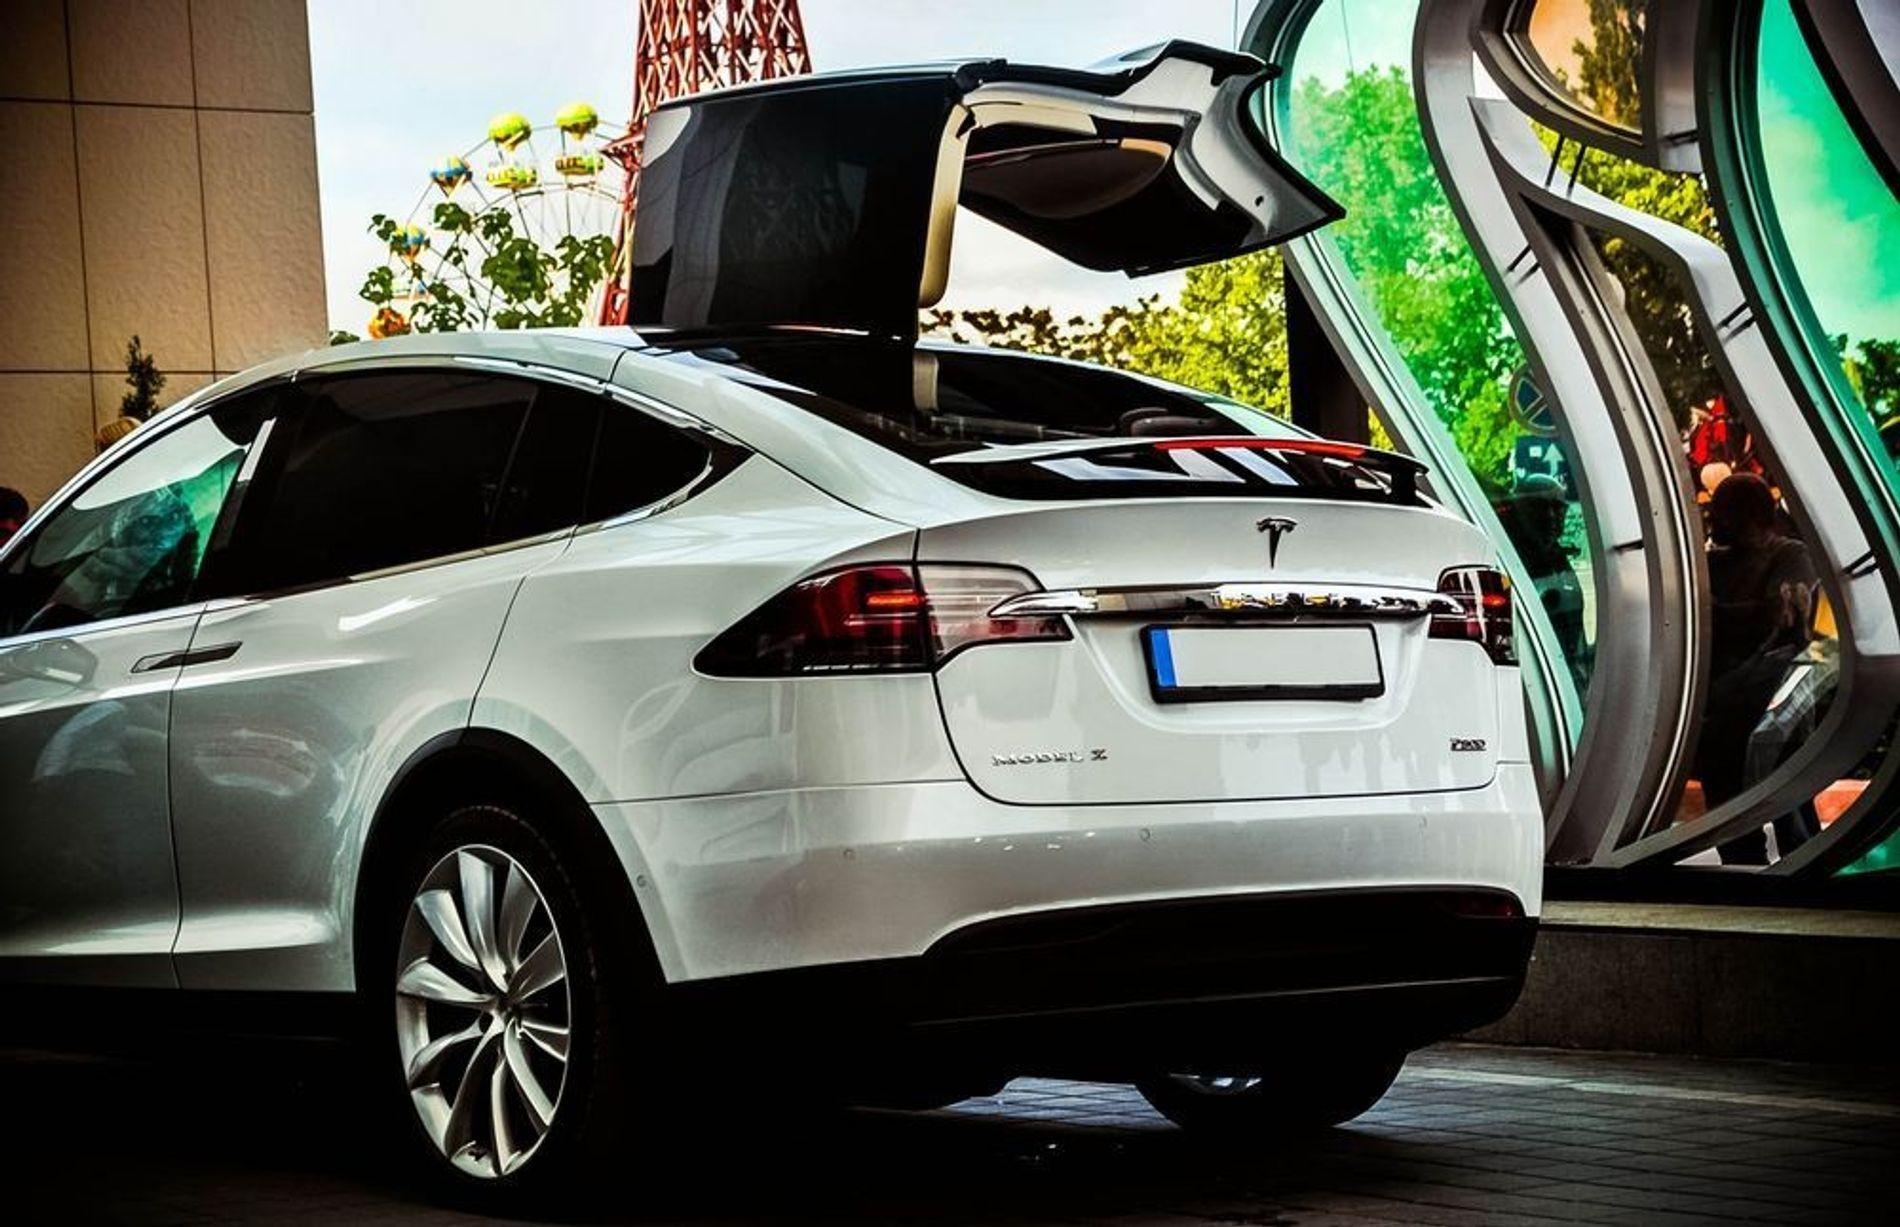 Modelo X de Tesla